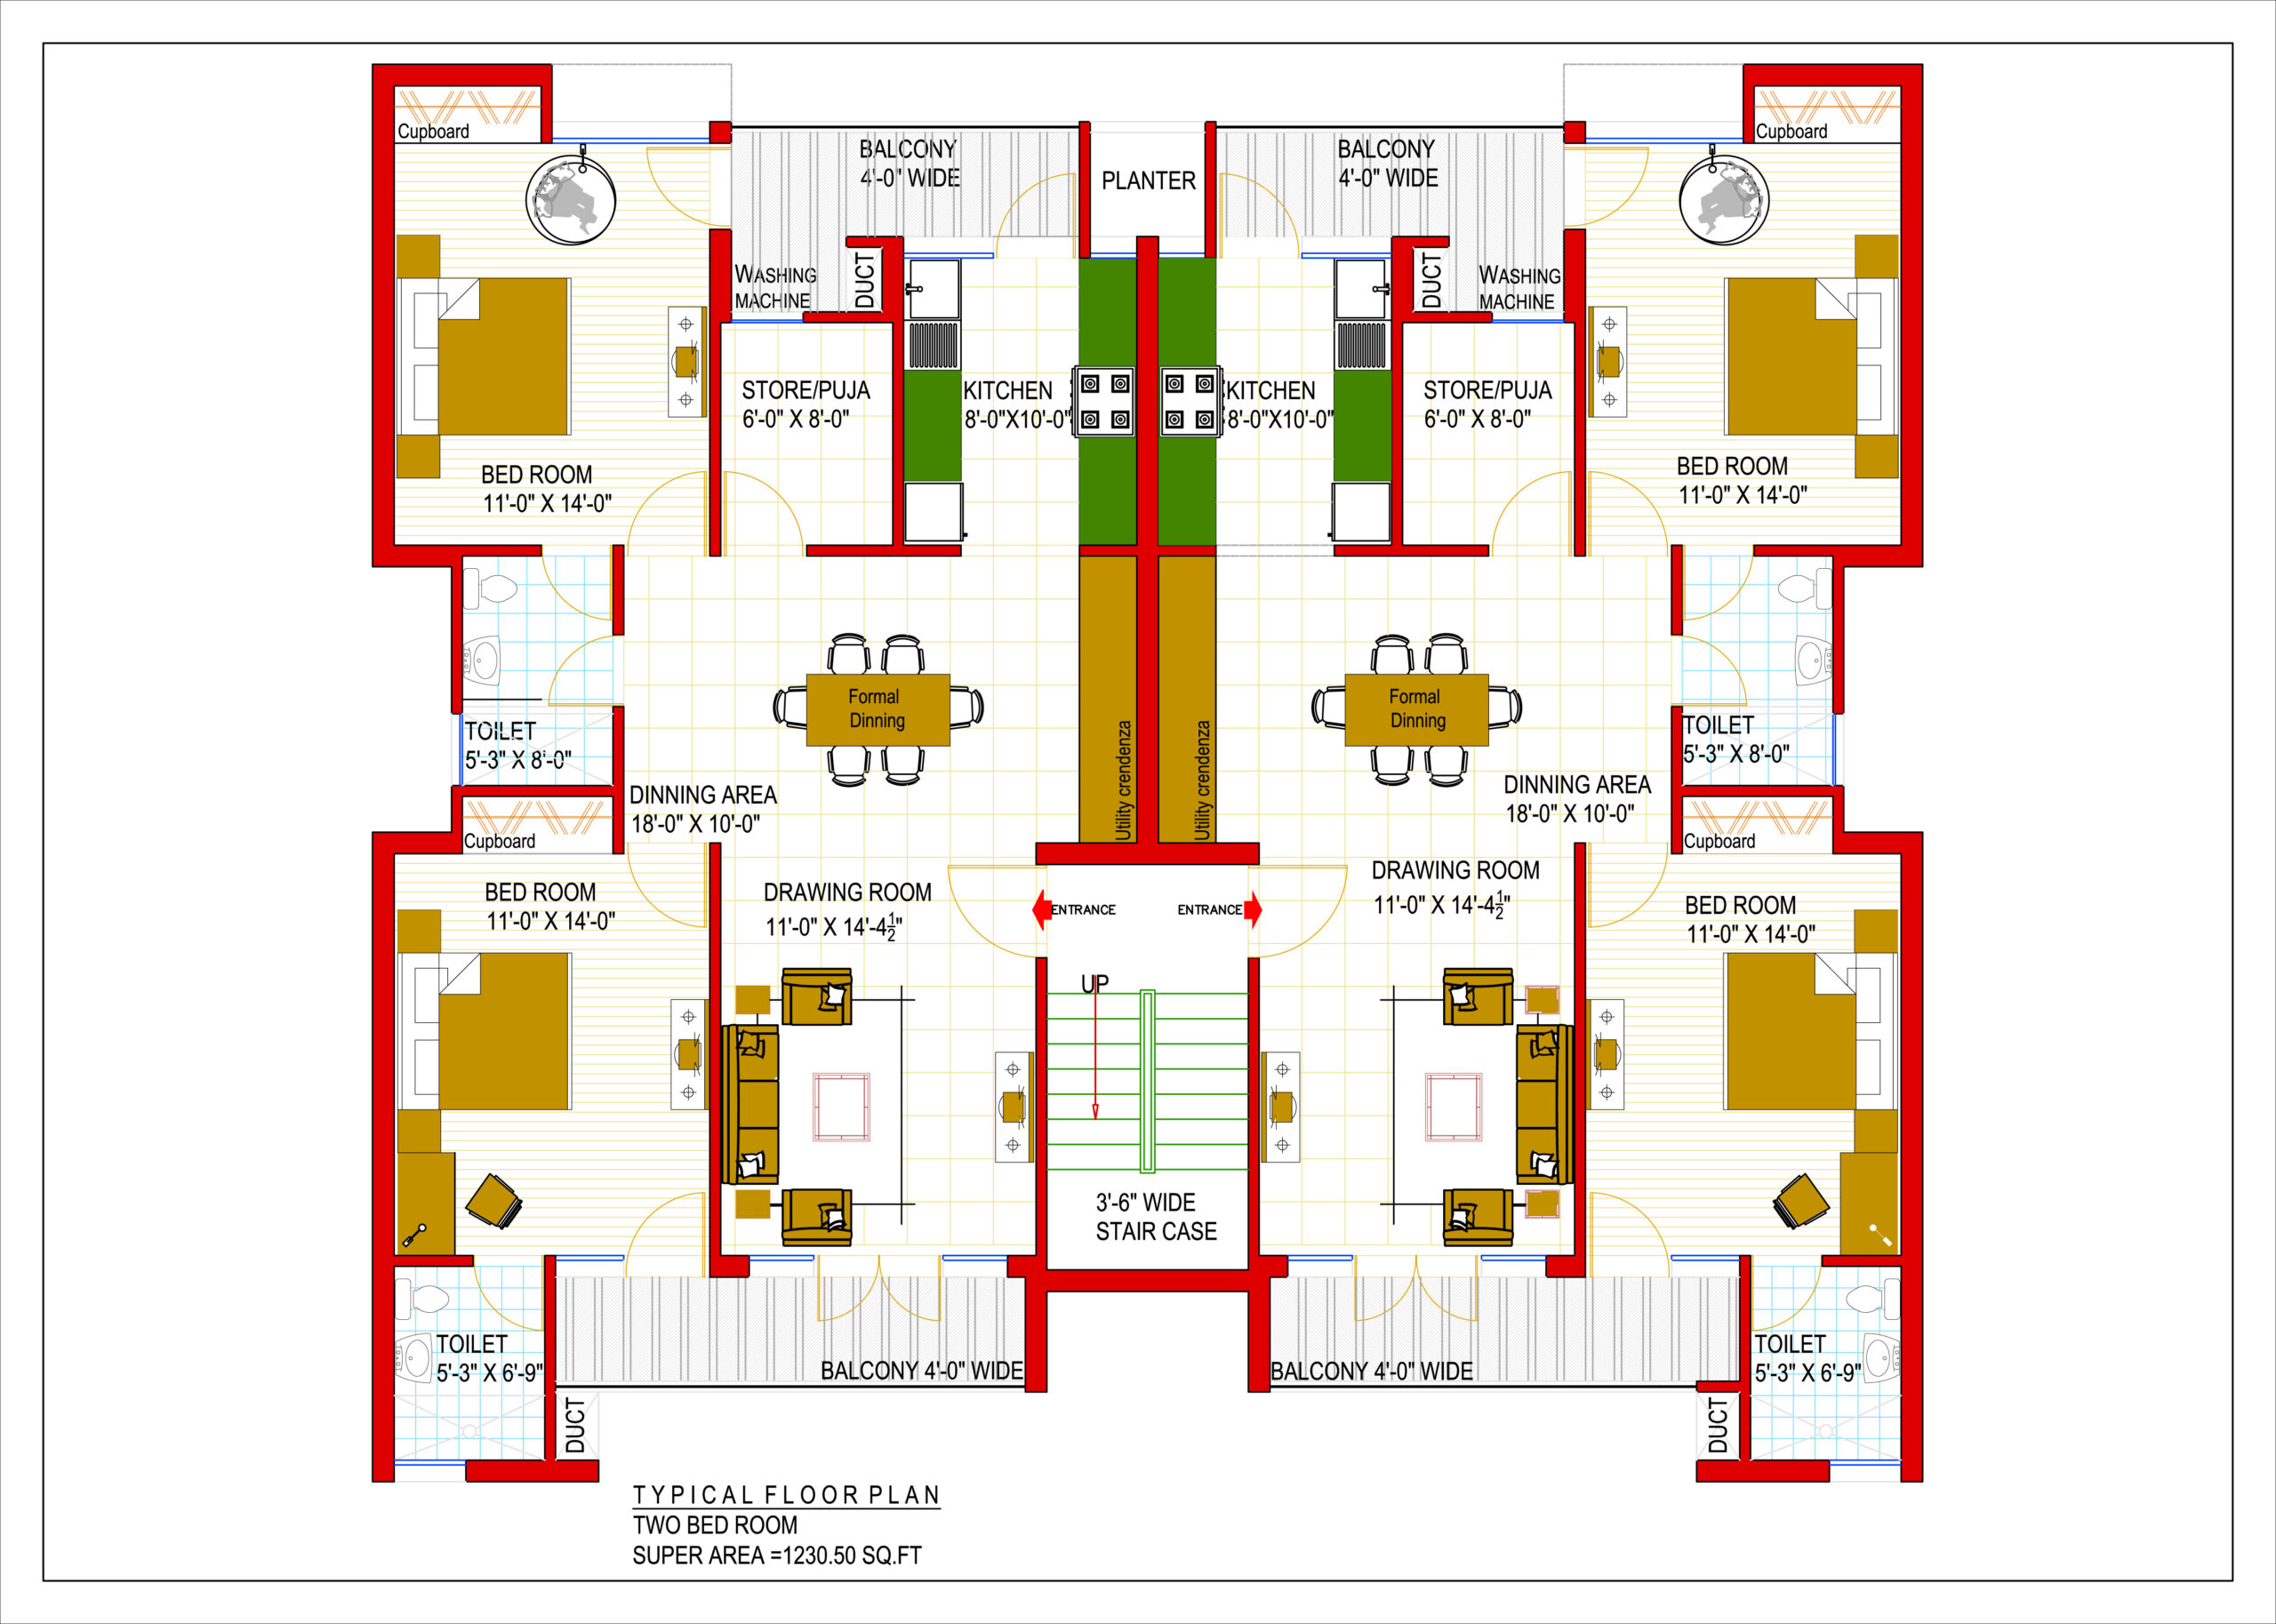 C:Documents and SettingsAdministratorDesktop-1112 Model (1)